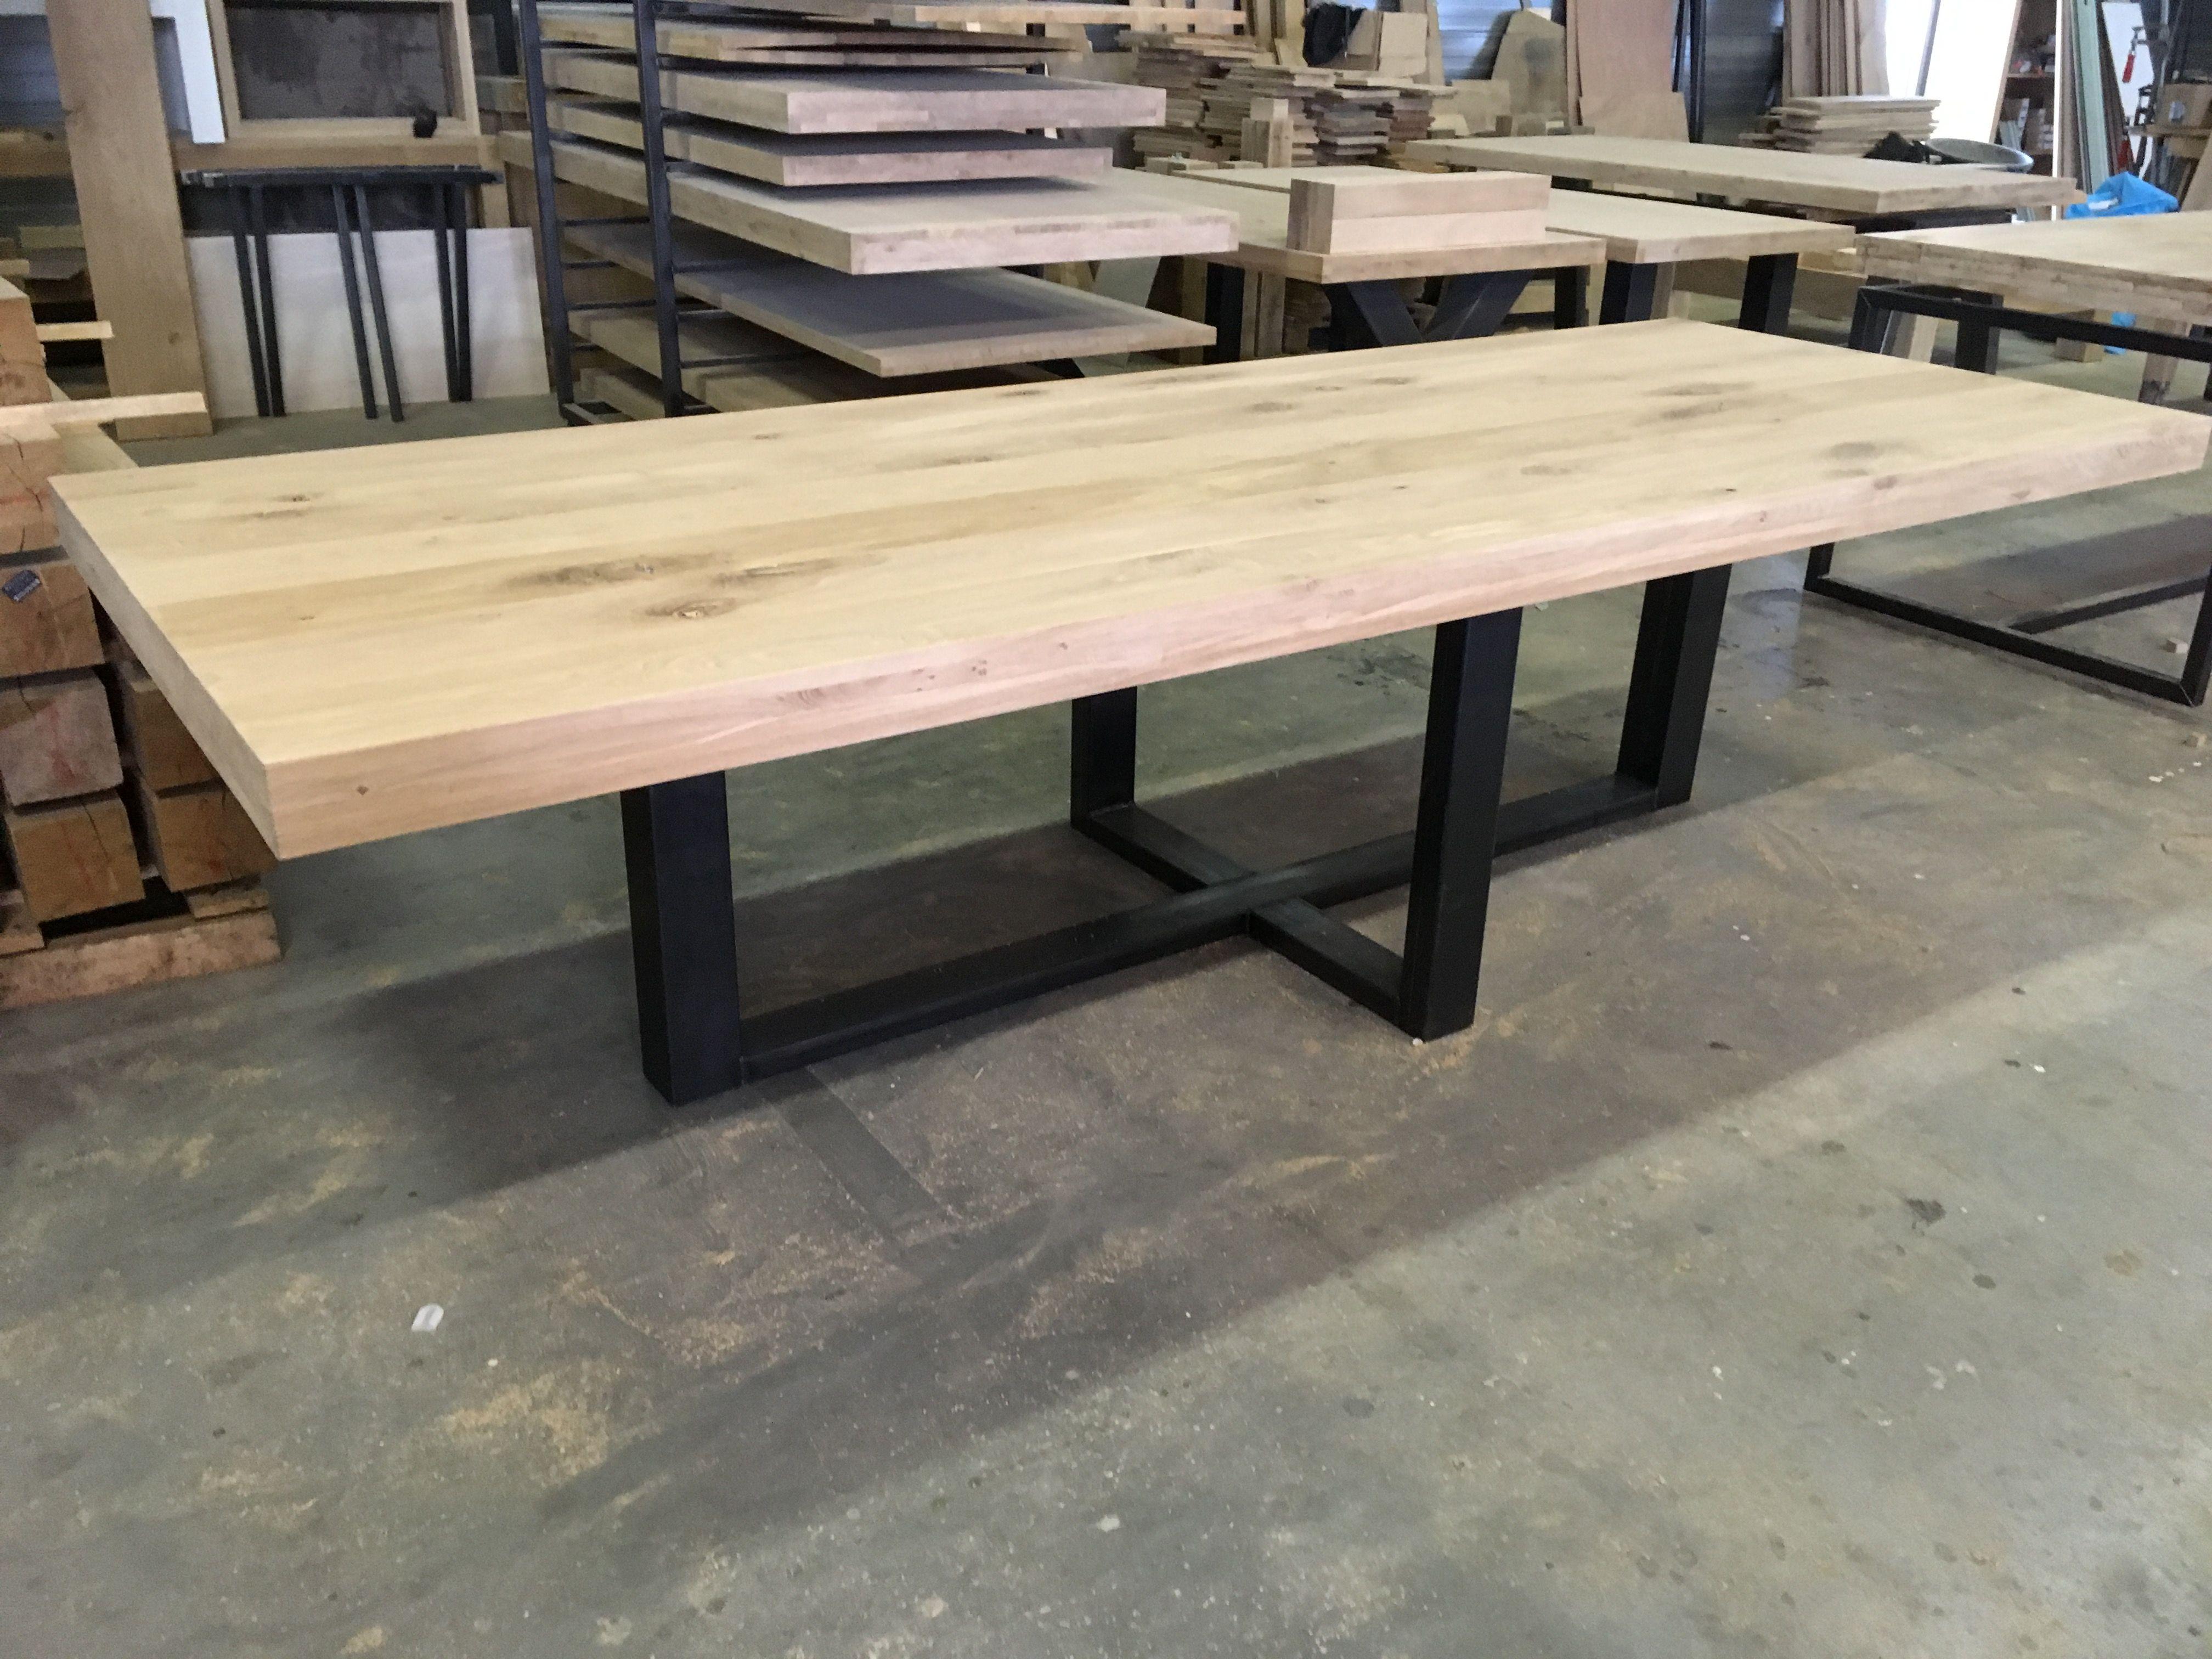 Moderne Eikenhouten Eettafel.Massief Eiken Tafel Met Stalen Onderstel Www Kaldenbach